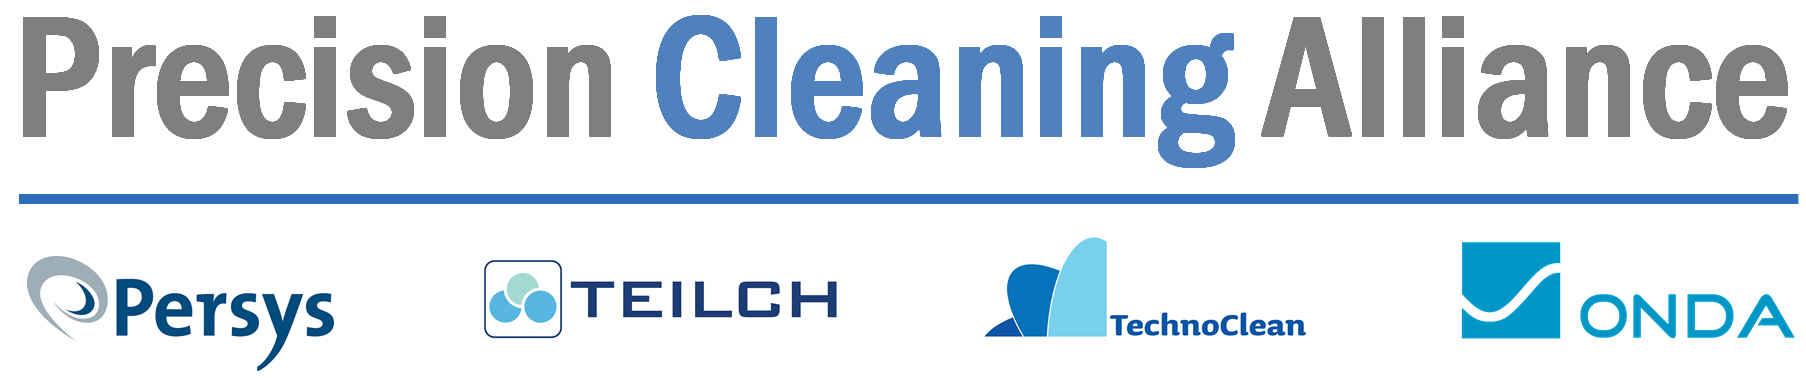 PrecisionCleaningAlliance_Logo3